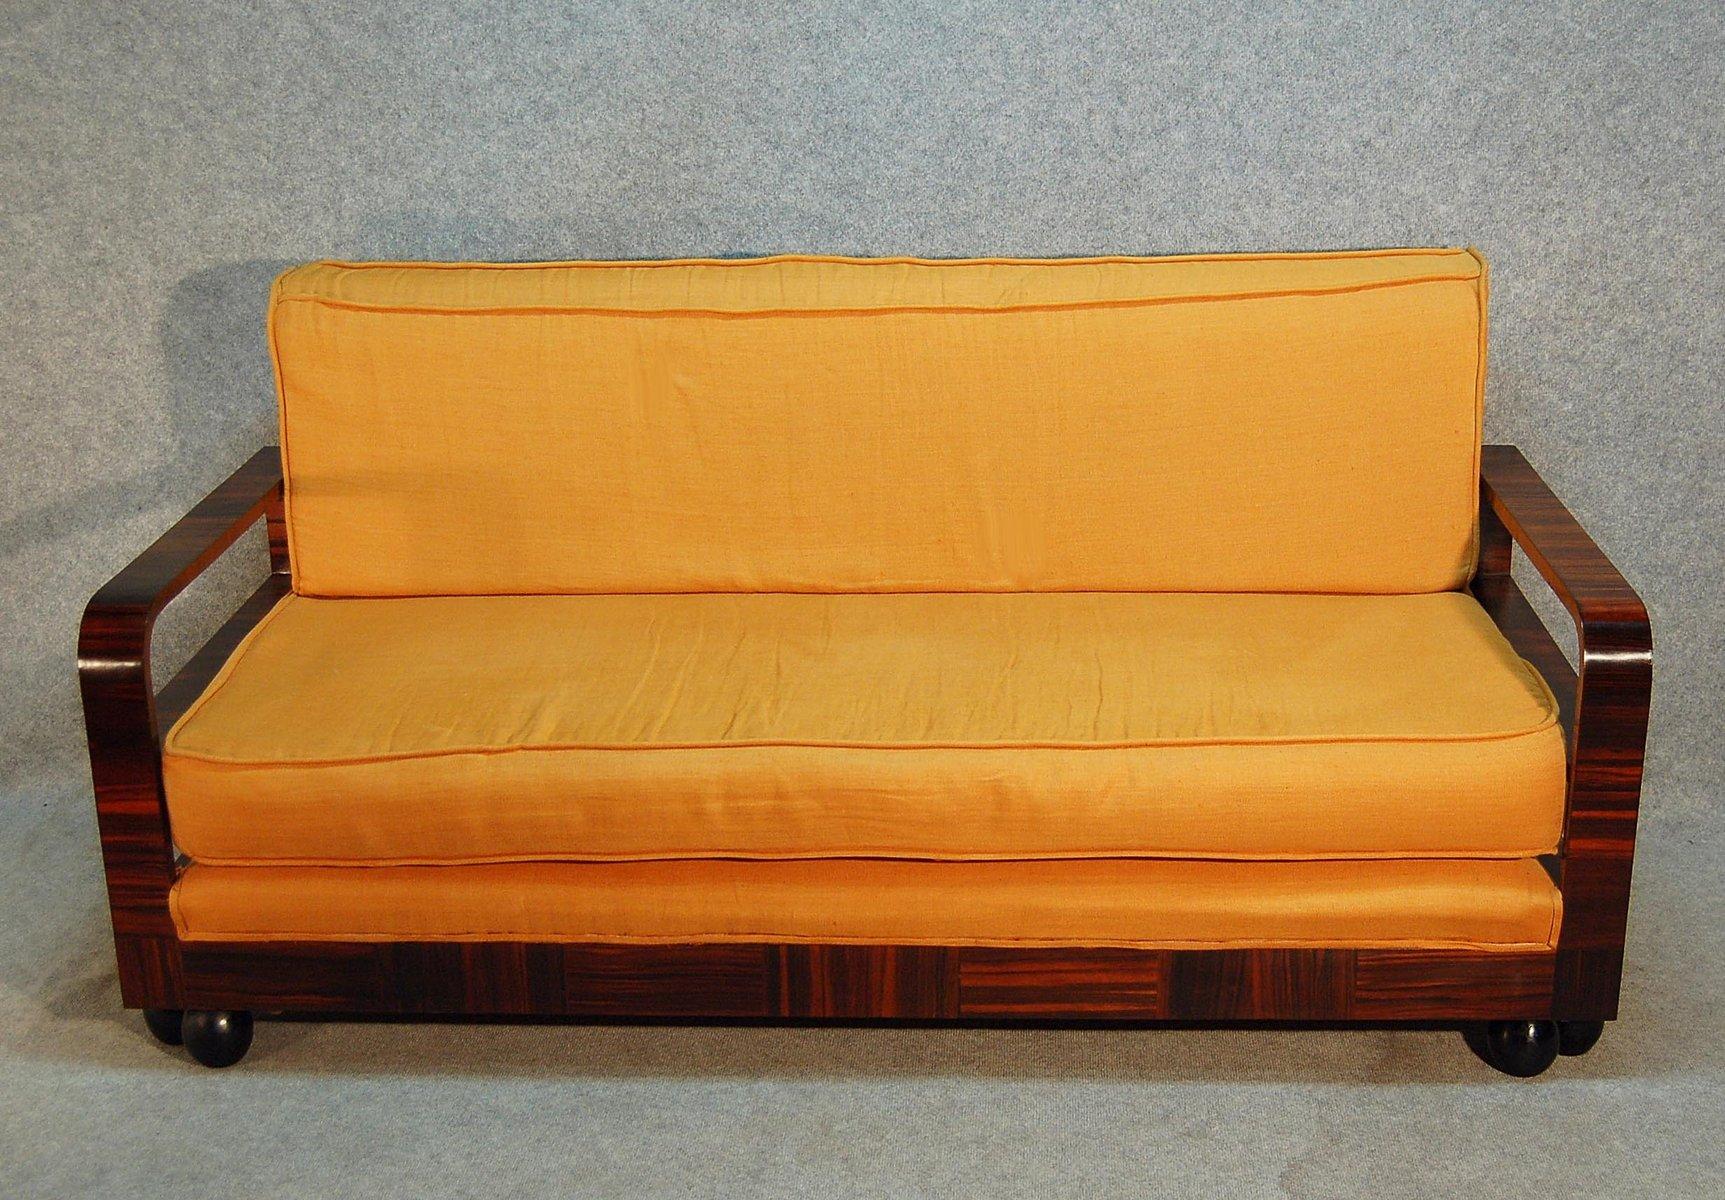 Art deco macassar ebony divan 1930s for sale at pamono for Divan vintage